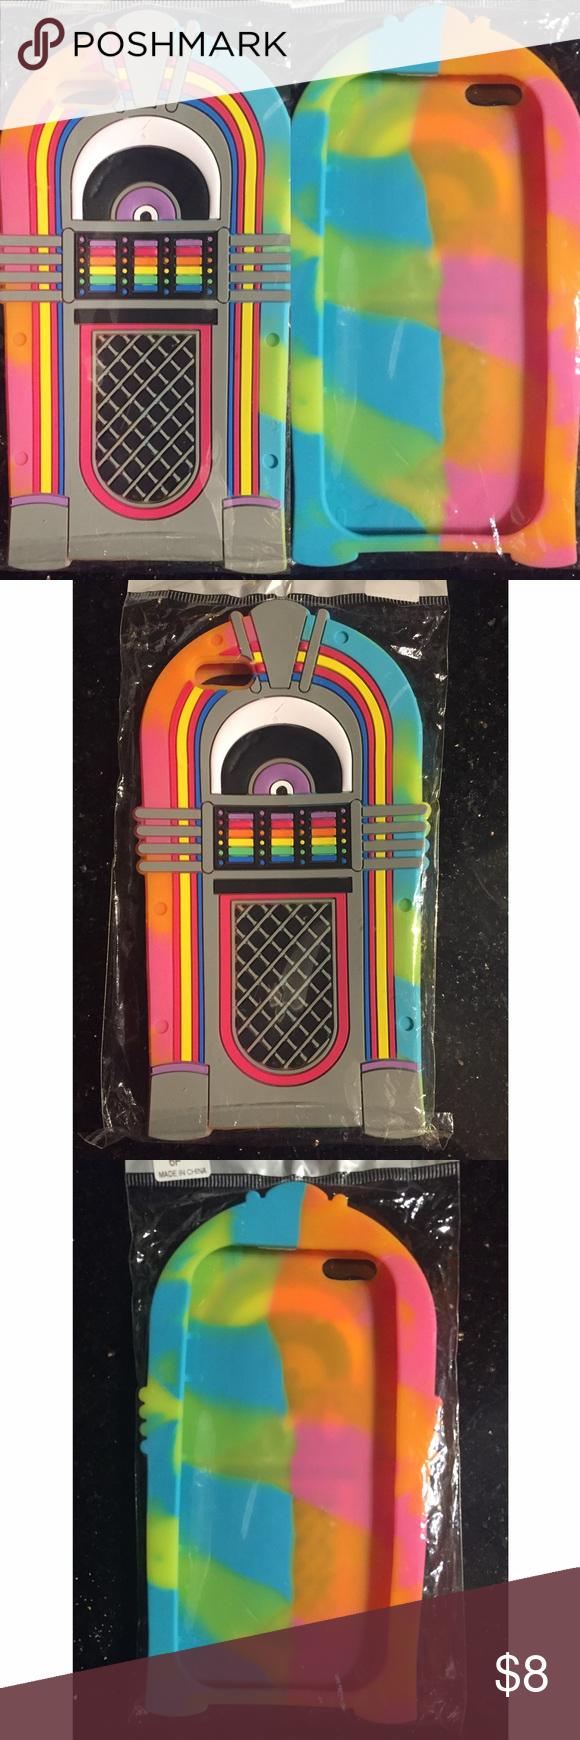 Silicone Rainbow Jukebox iPhone 6 Plus Case NWT Iphone 6